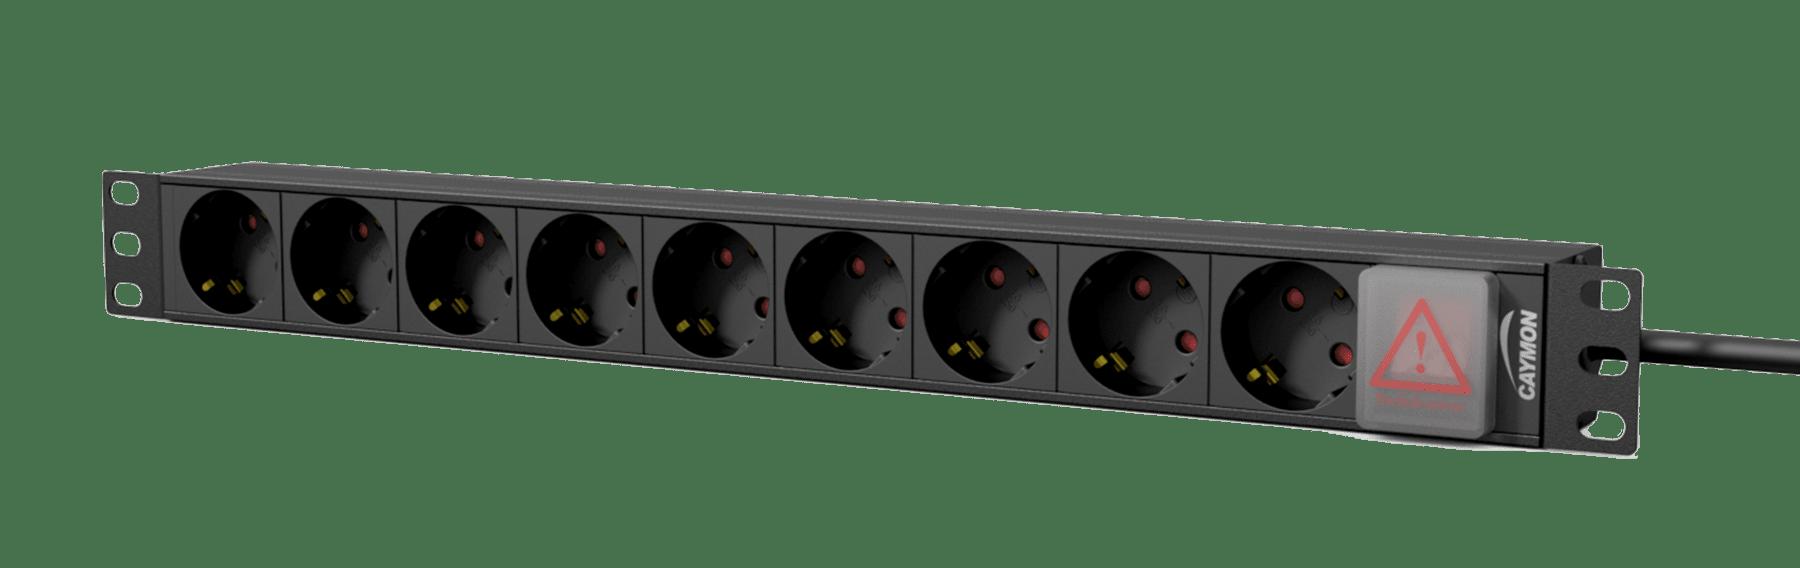 "PSR109GS - 19"" power distribution unit - 9 x German sockets + front switch"